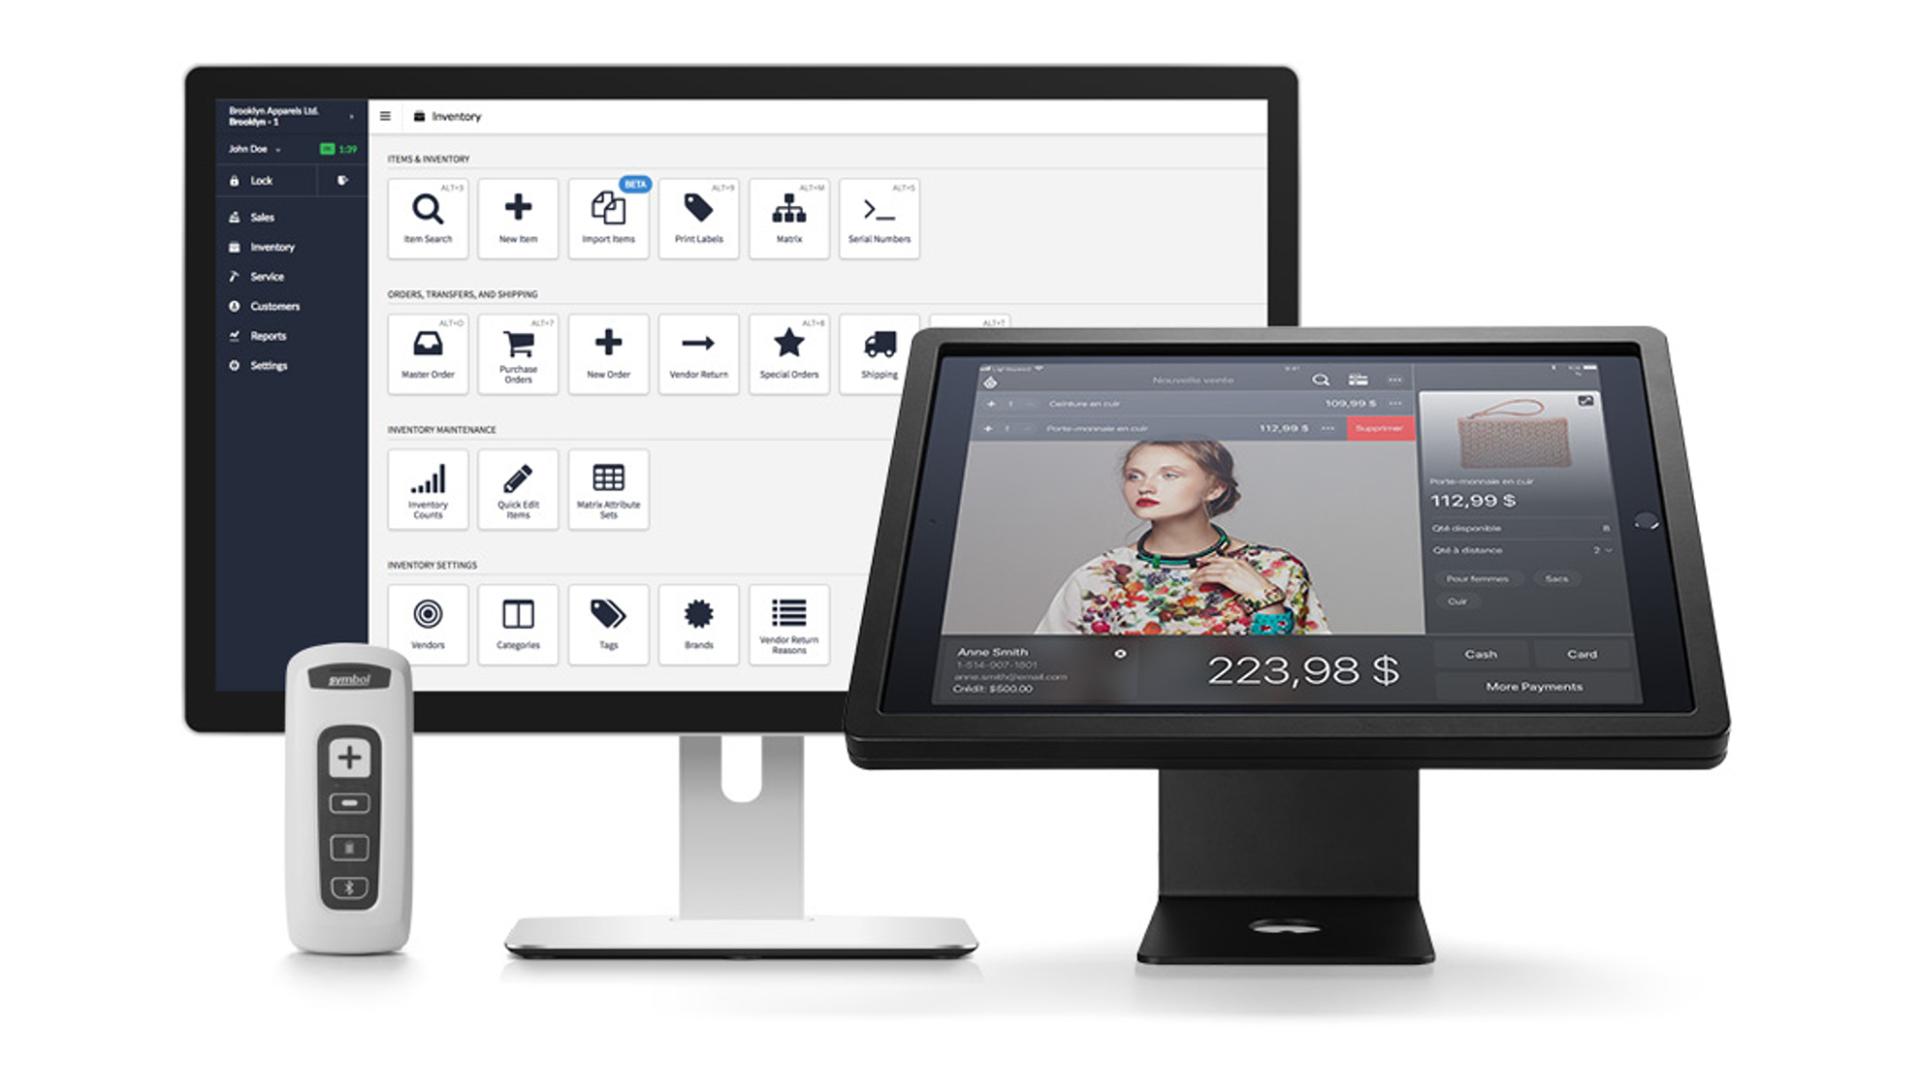 Lightspeed's iPad and desktop solutions